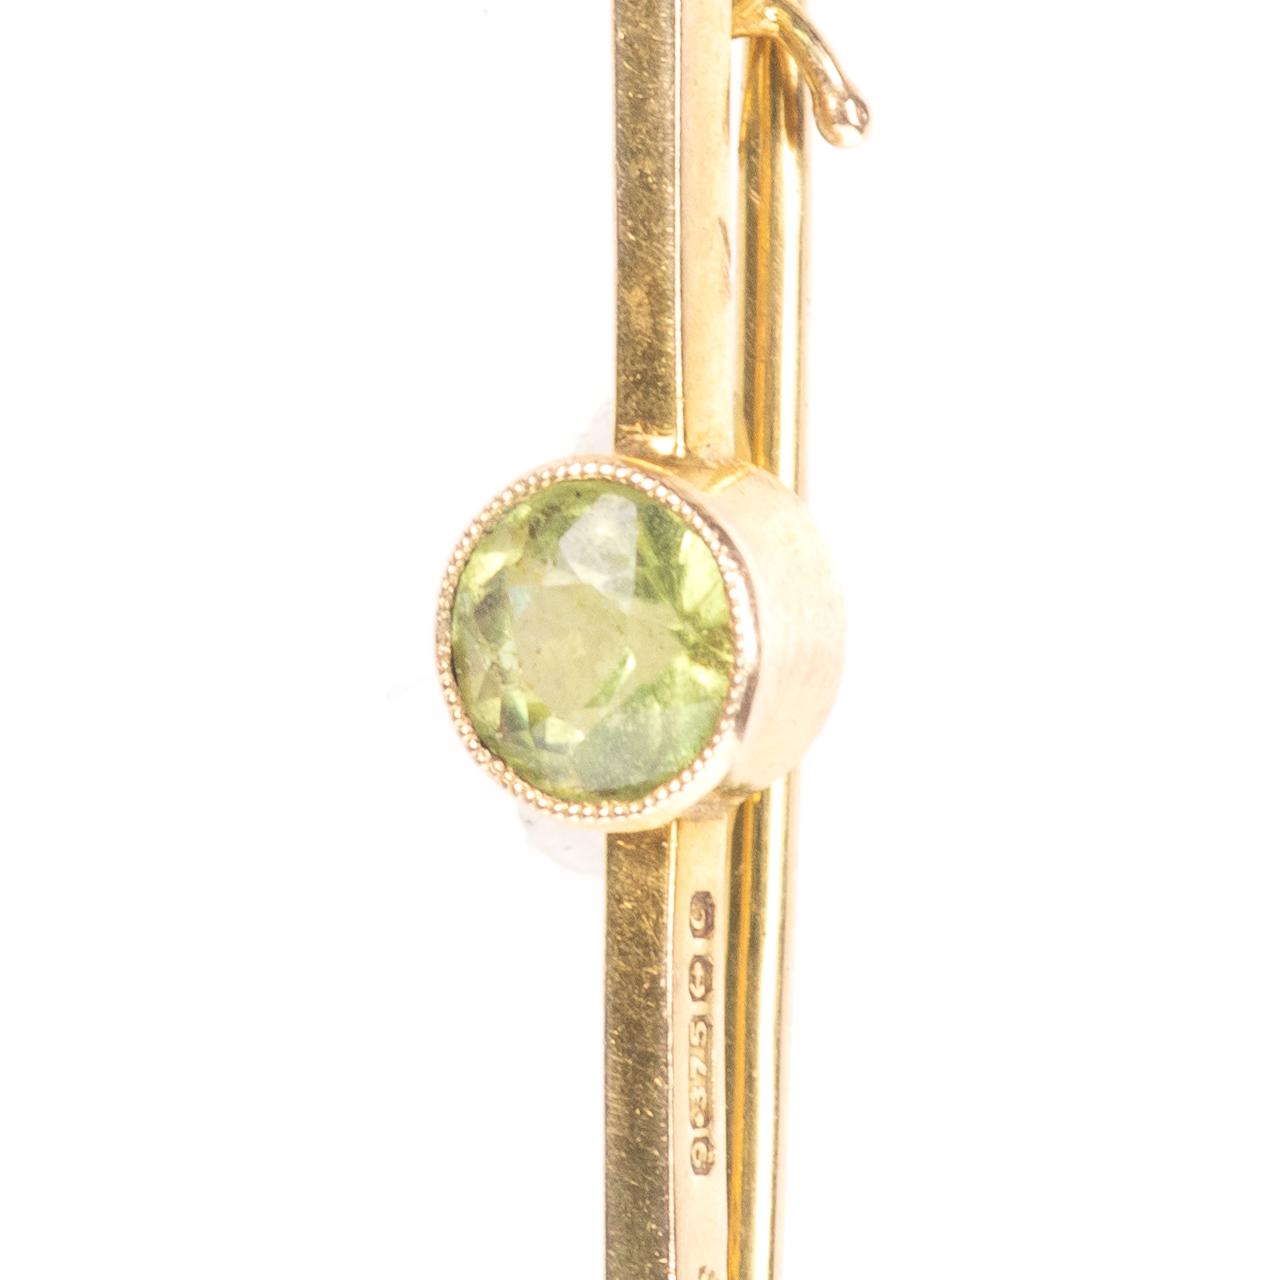 9ct Gold 0.50ct Peridot Brooch Birmingham 1977 Cropp & Farr Ltd - Image 3 of 6